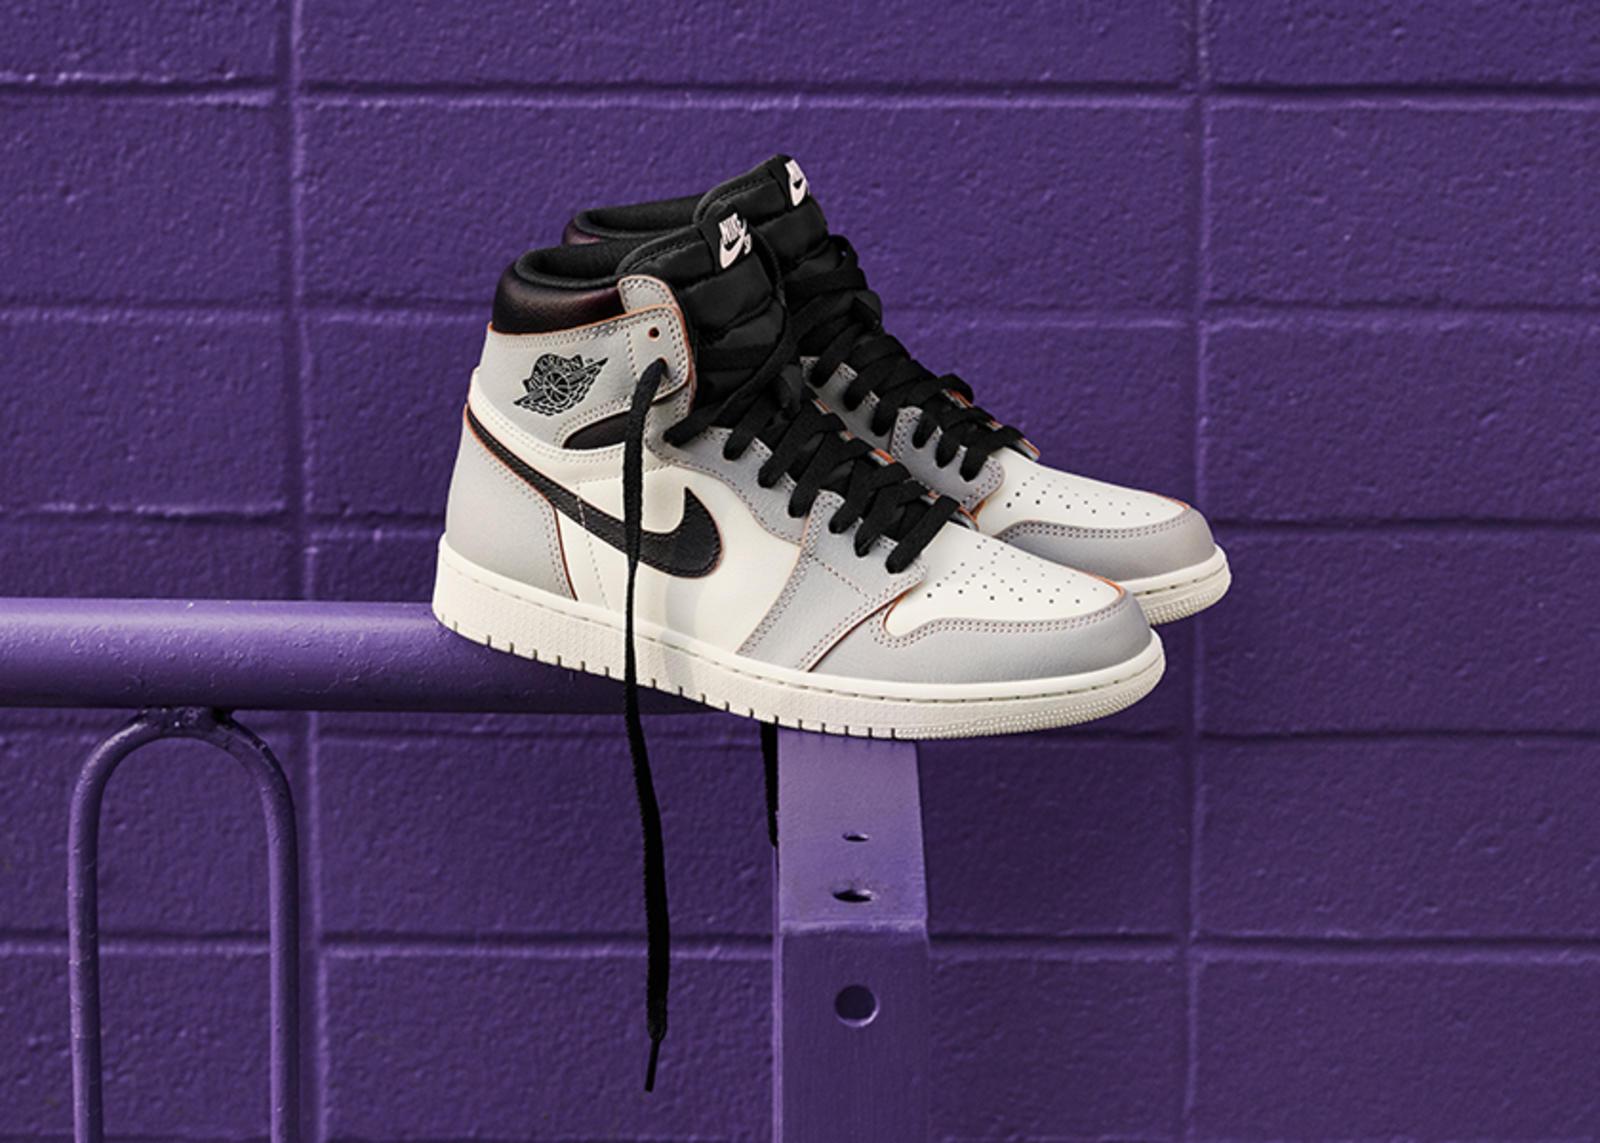 sneakers for cheap differently popular brand Air Jordan 1 Nike SB - Nike News